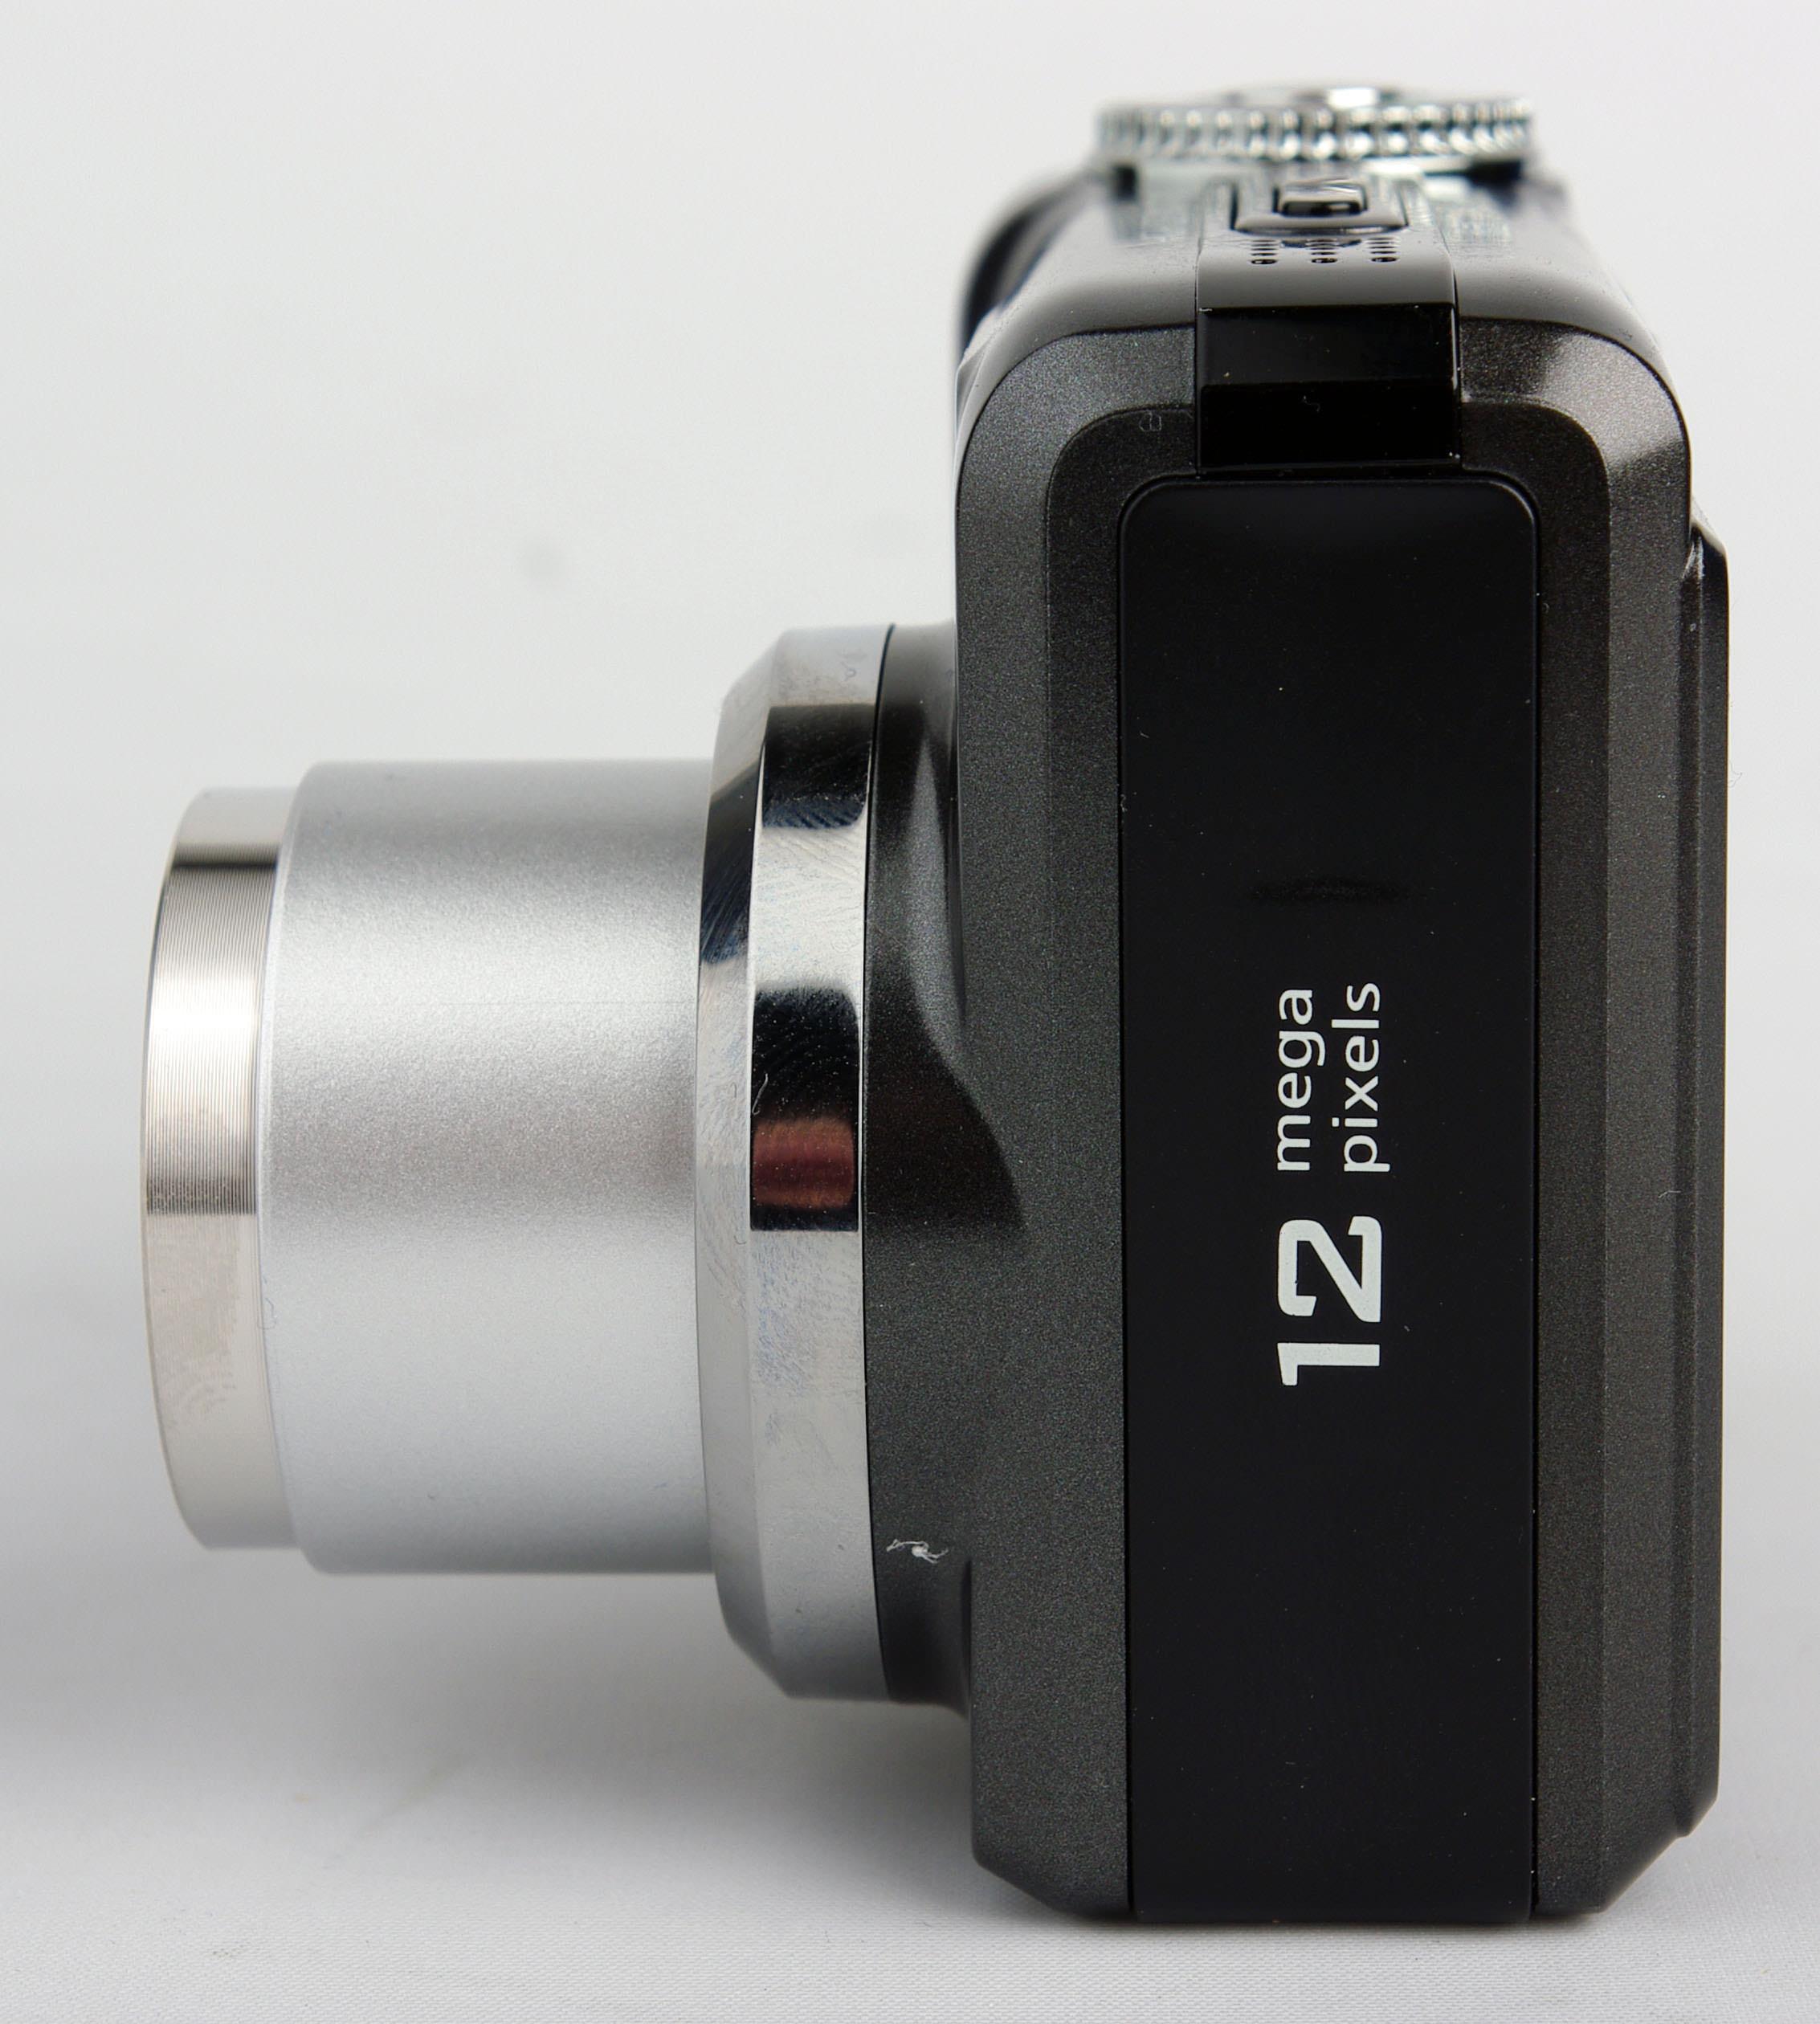 kodak easyshare z1285 digital camera review rh ephotozine com Kodak EasyShare Camera Accessories My Kodak Account